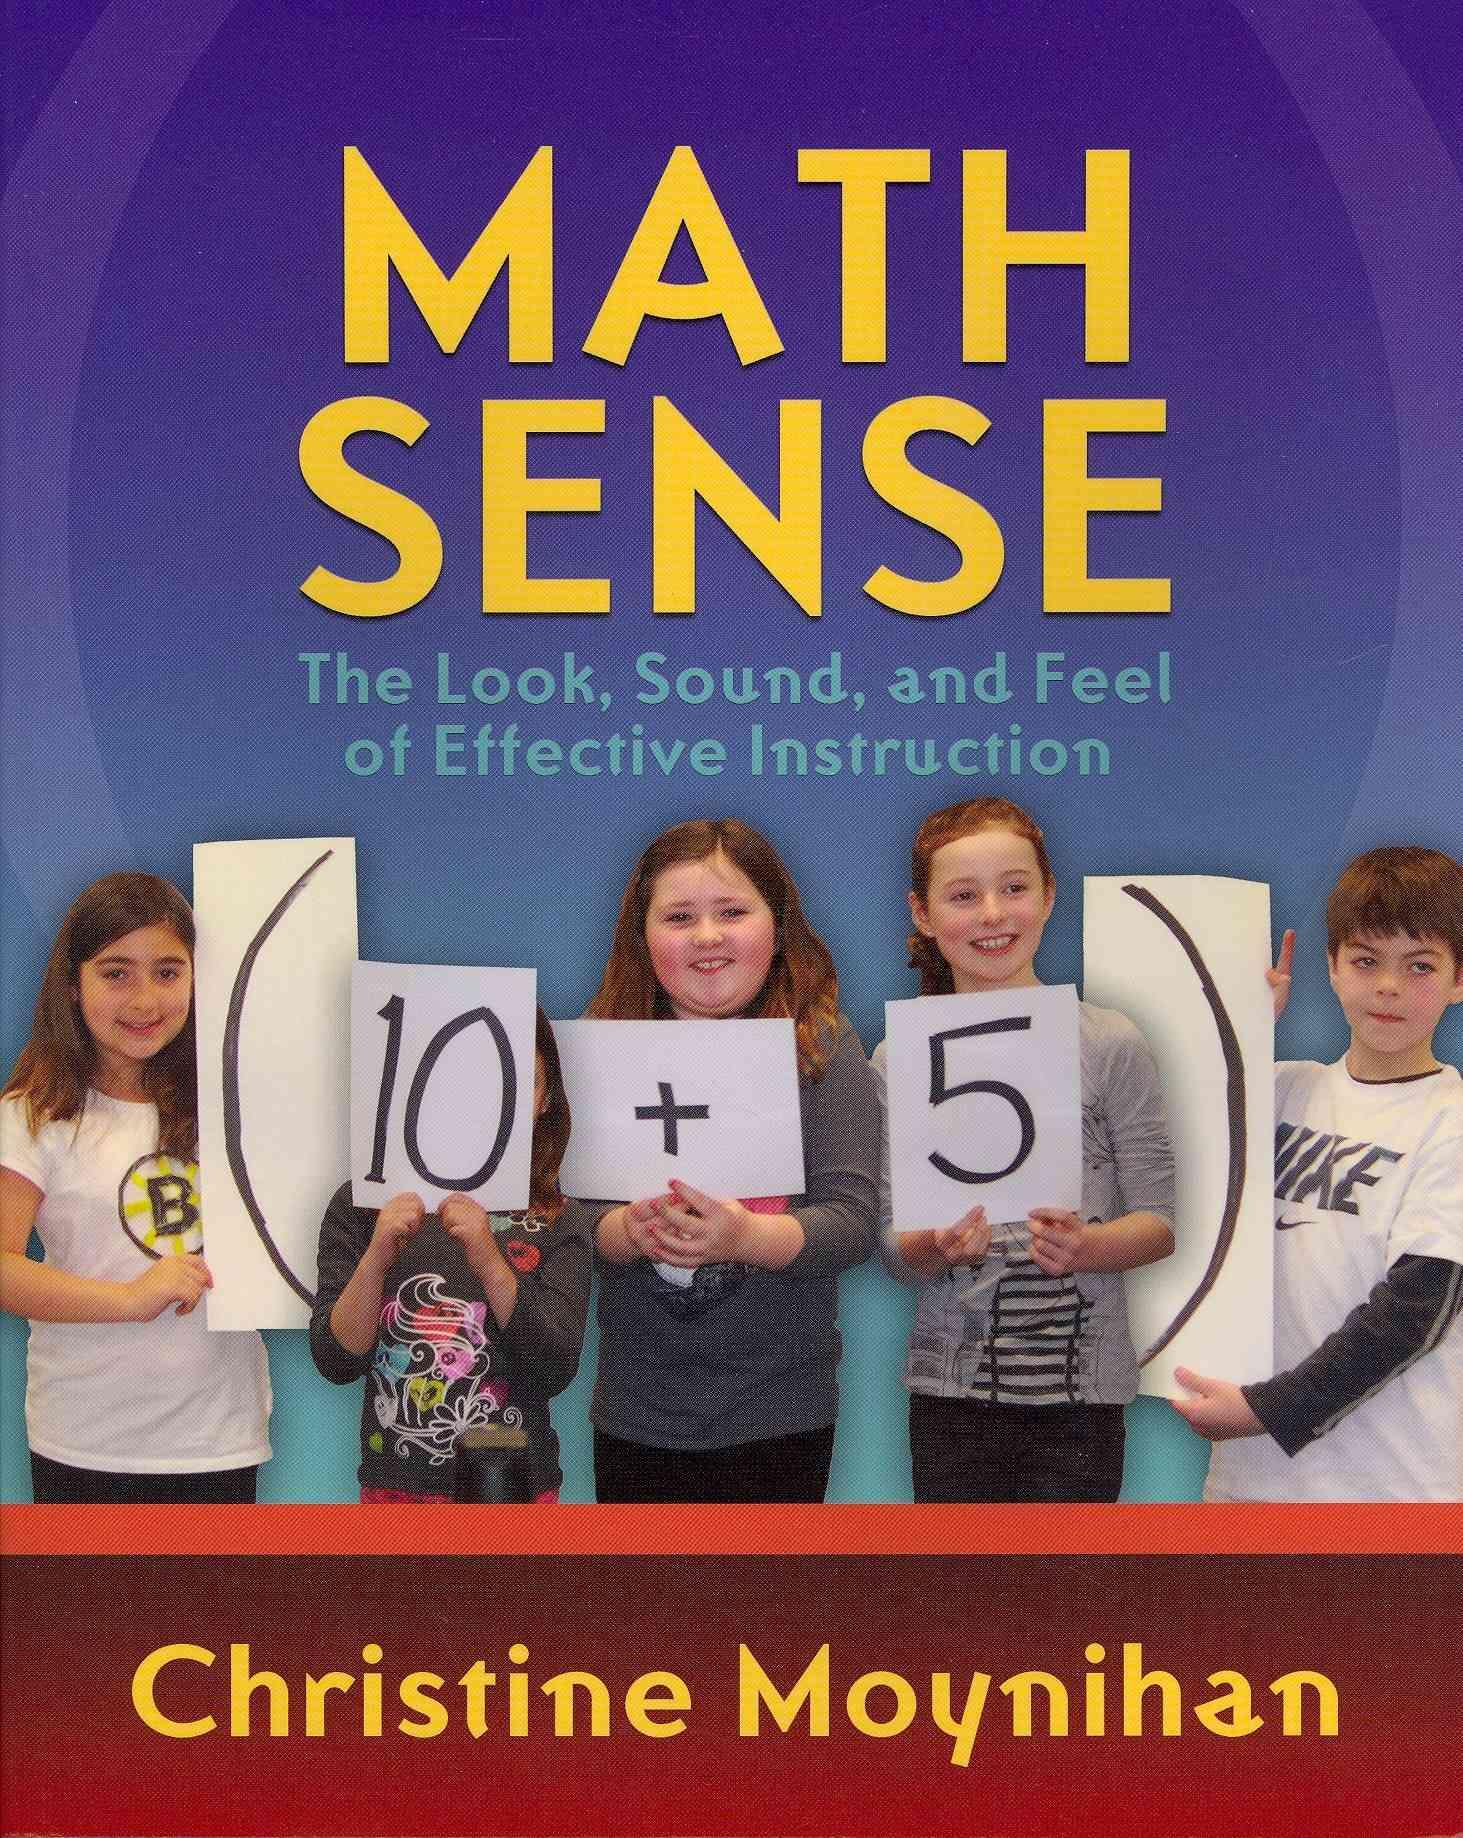 Math Sense By Christine Moynihan